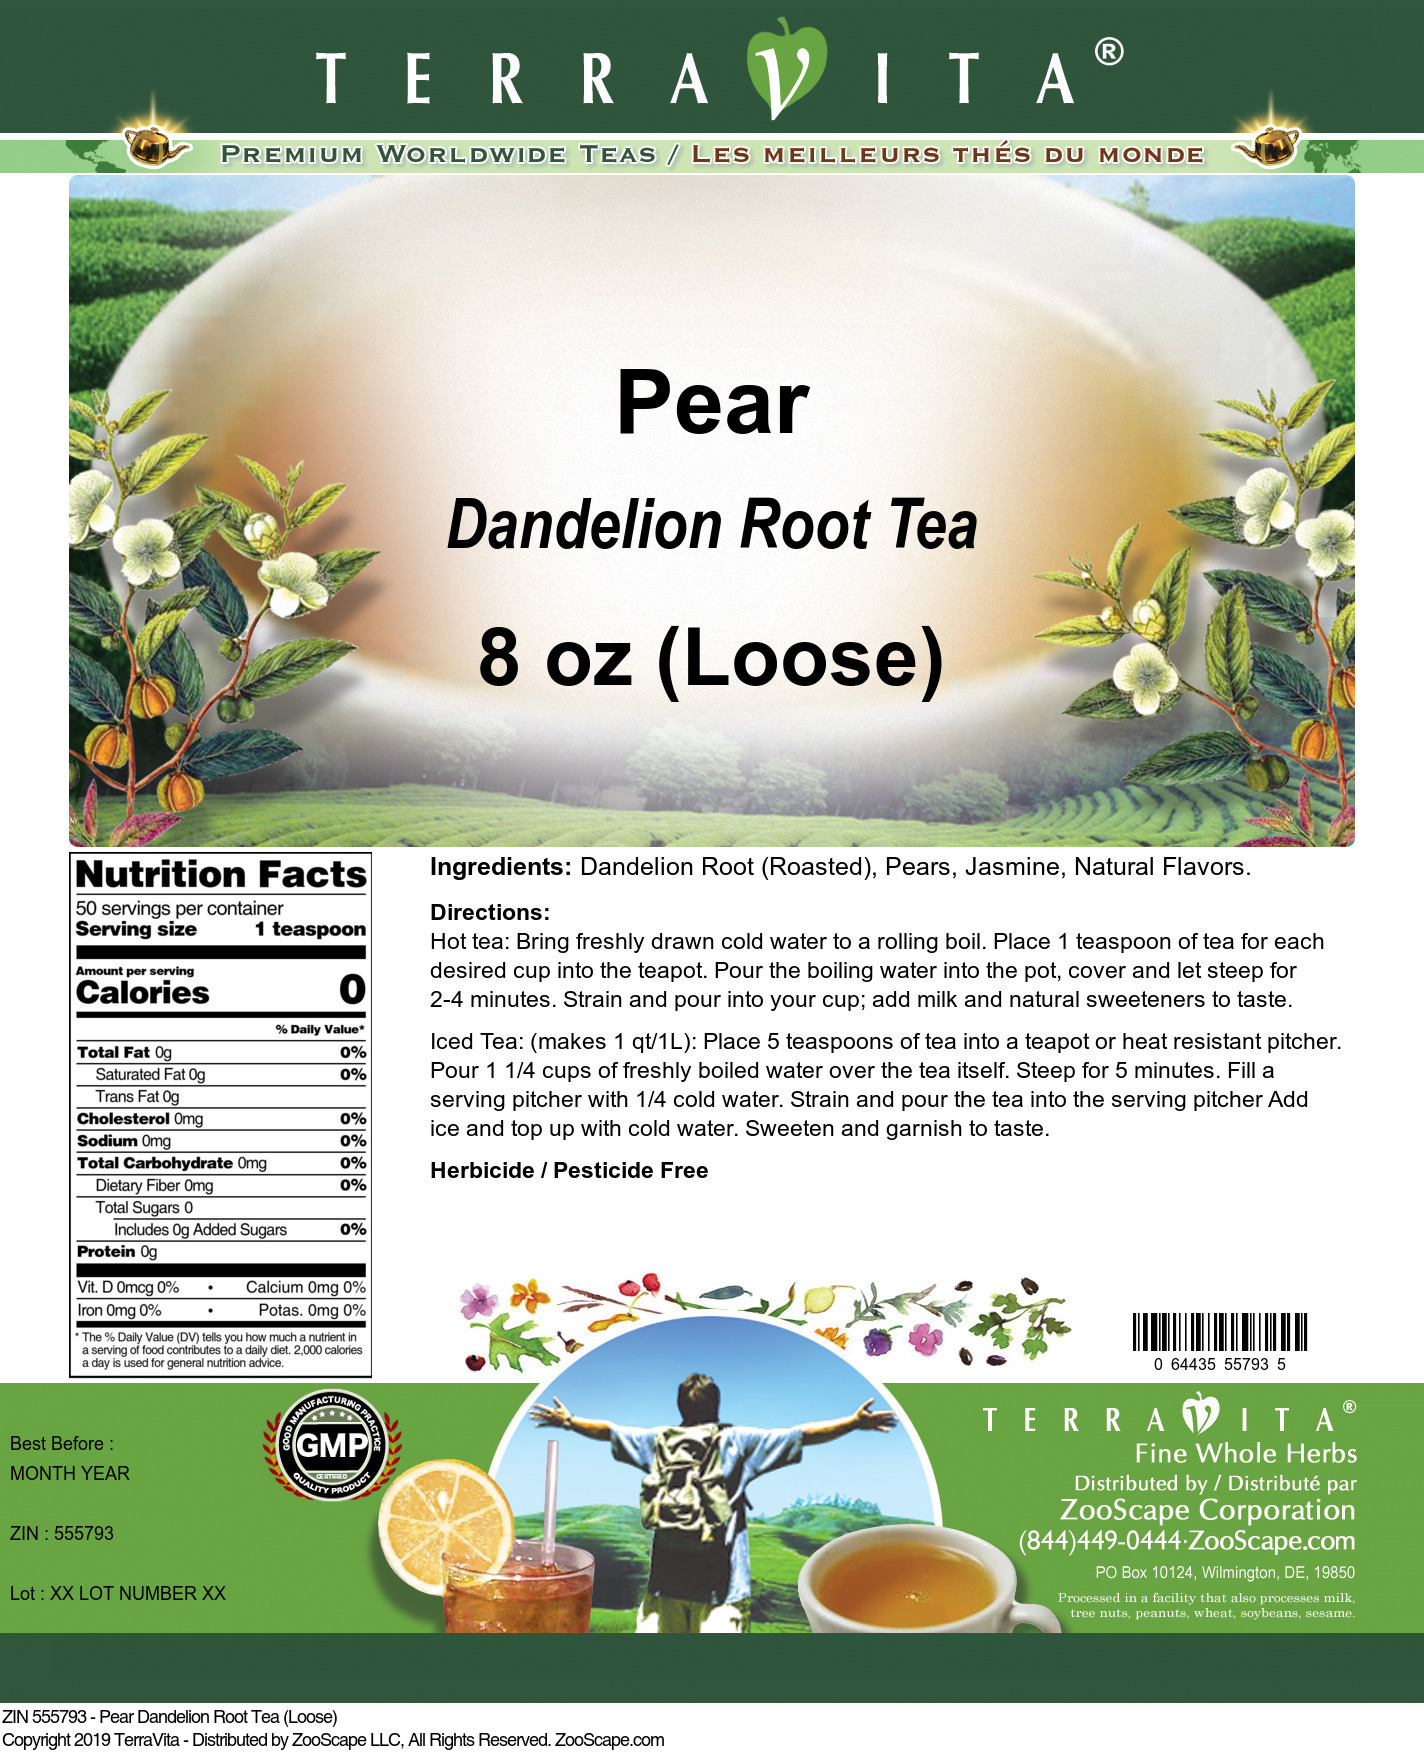 Pear Dandelion Root Tea (Loose)